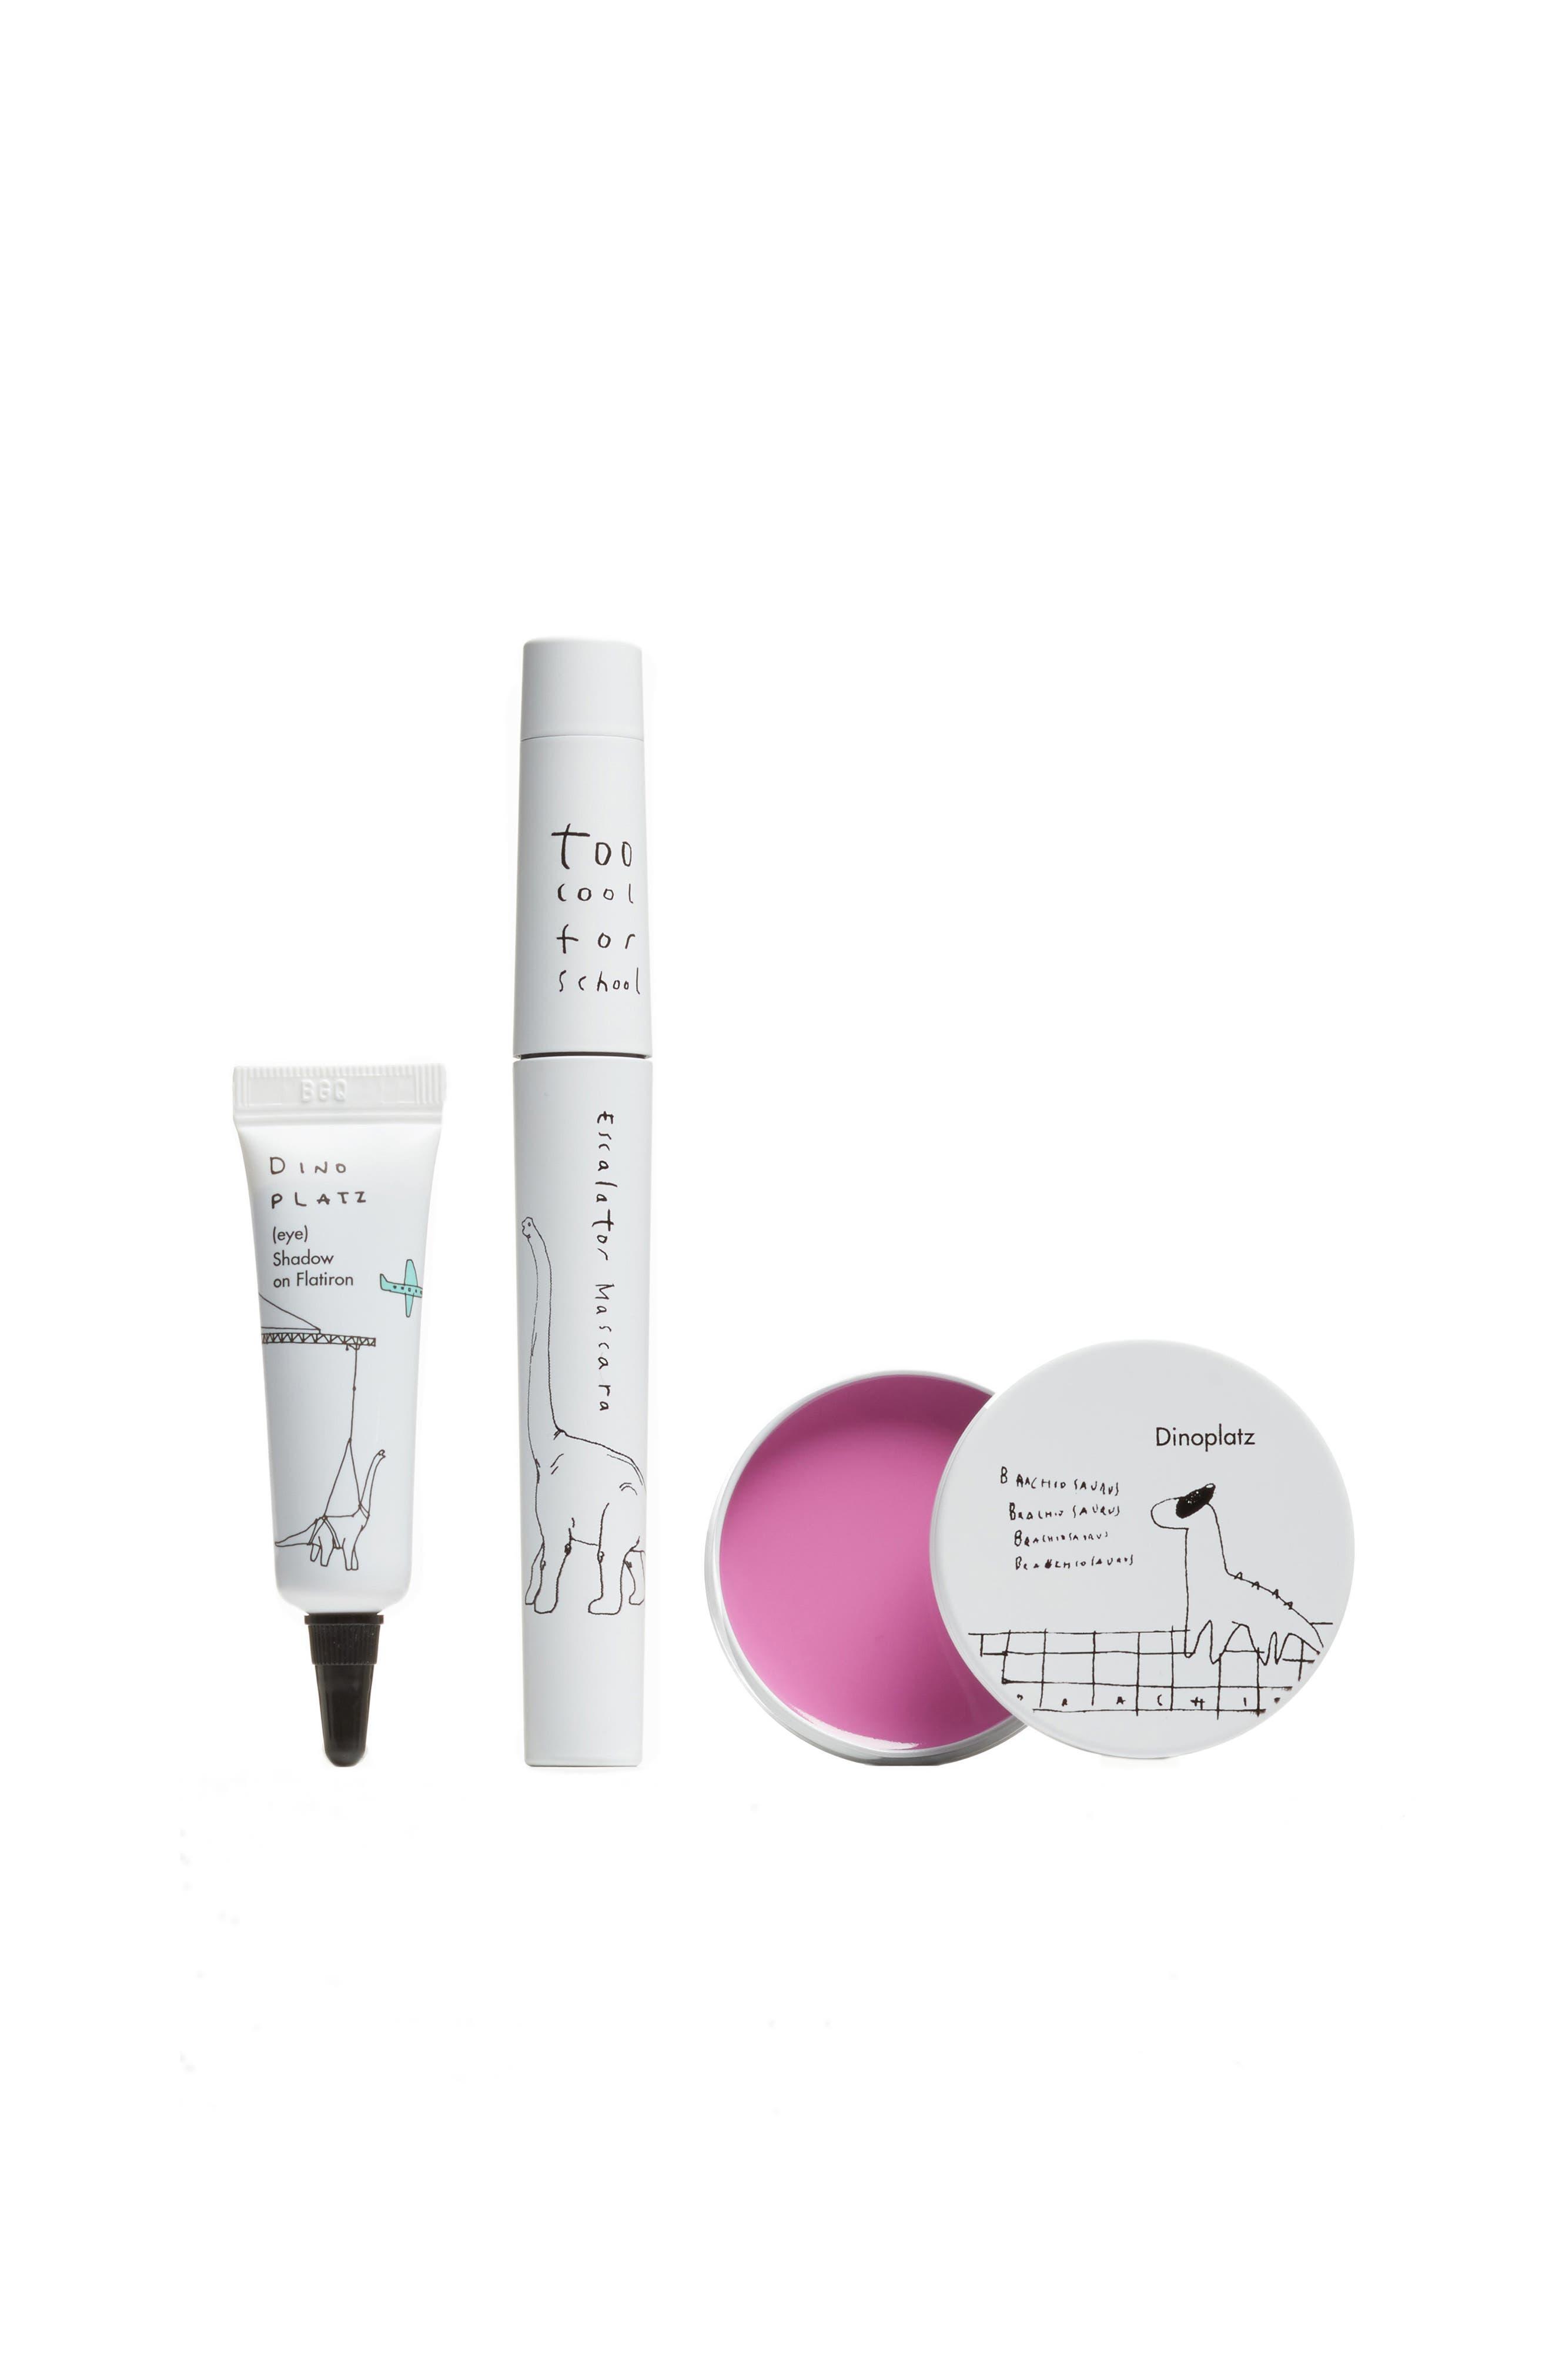 Too Cool for School Dinoplatz Makeup Essential Eye Shadow, Mascara & Lip Balm Set